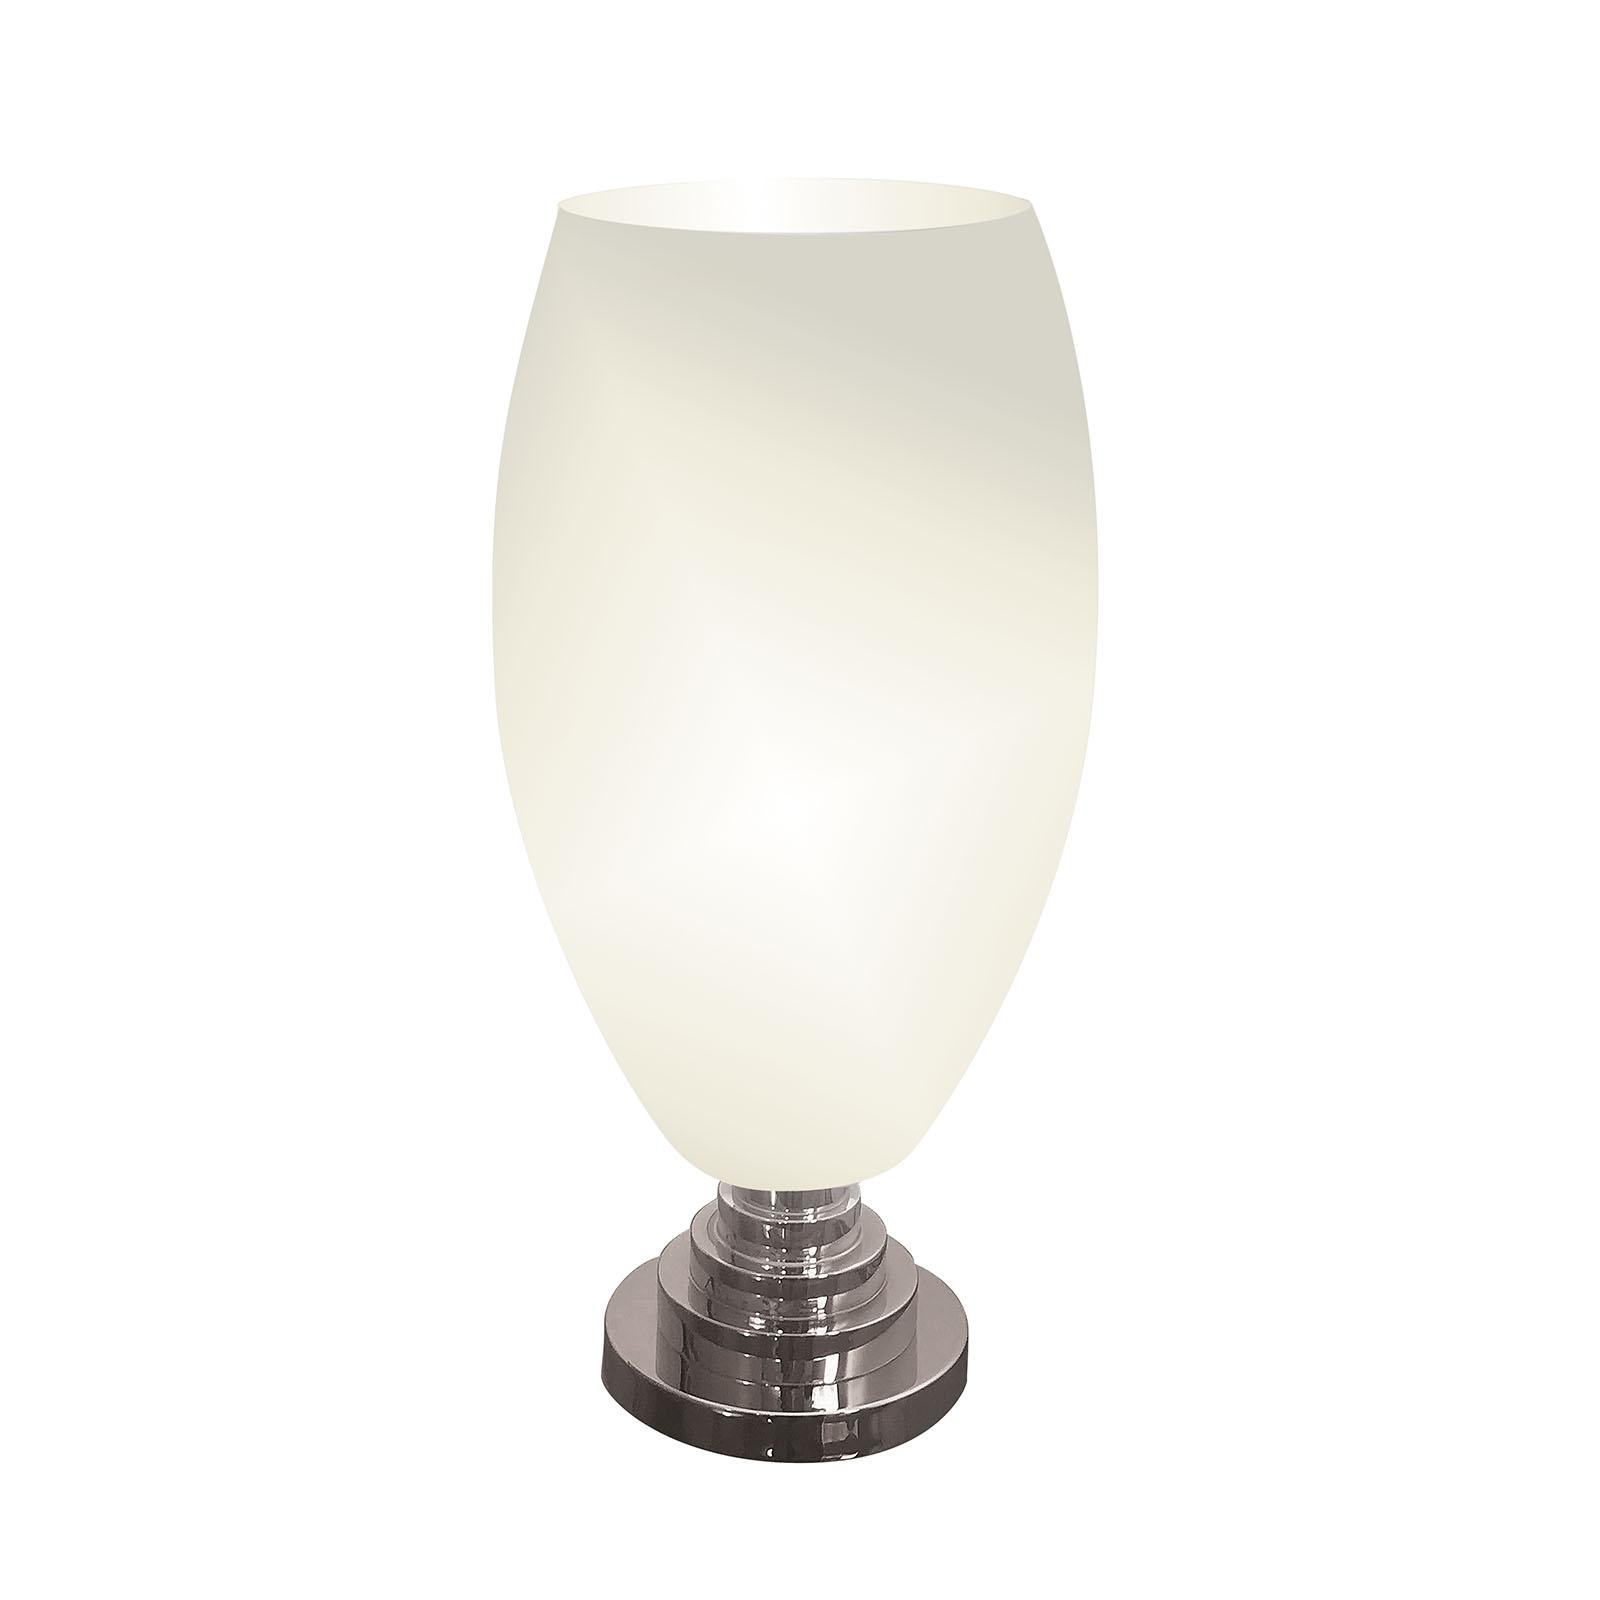 Lampe Jean Perzel 920 bis